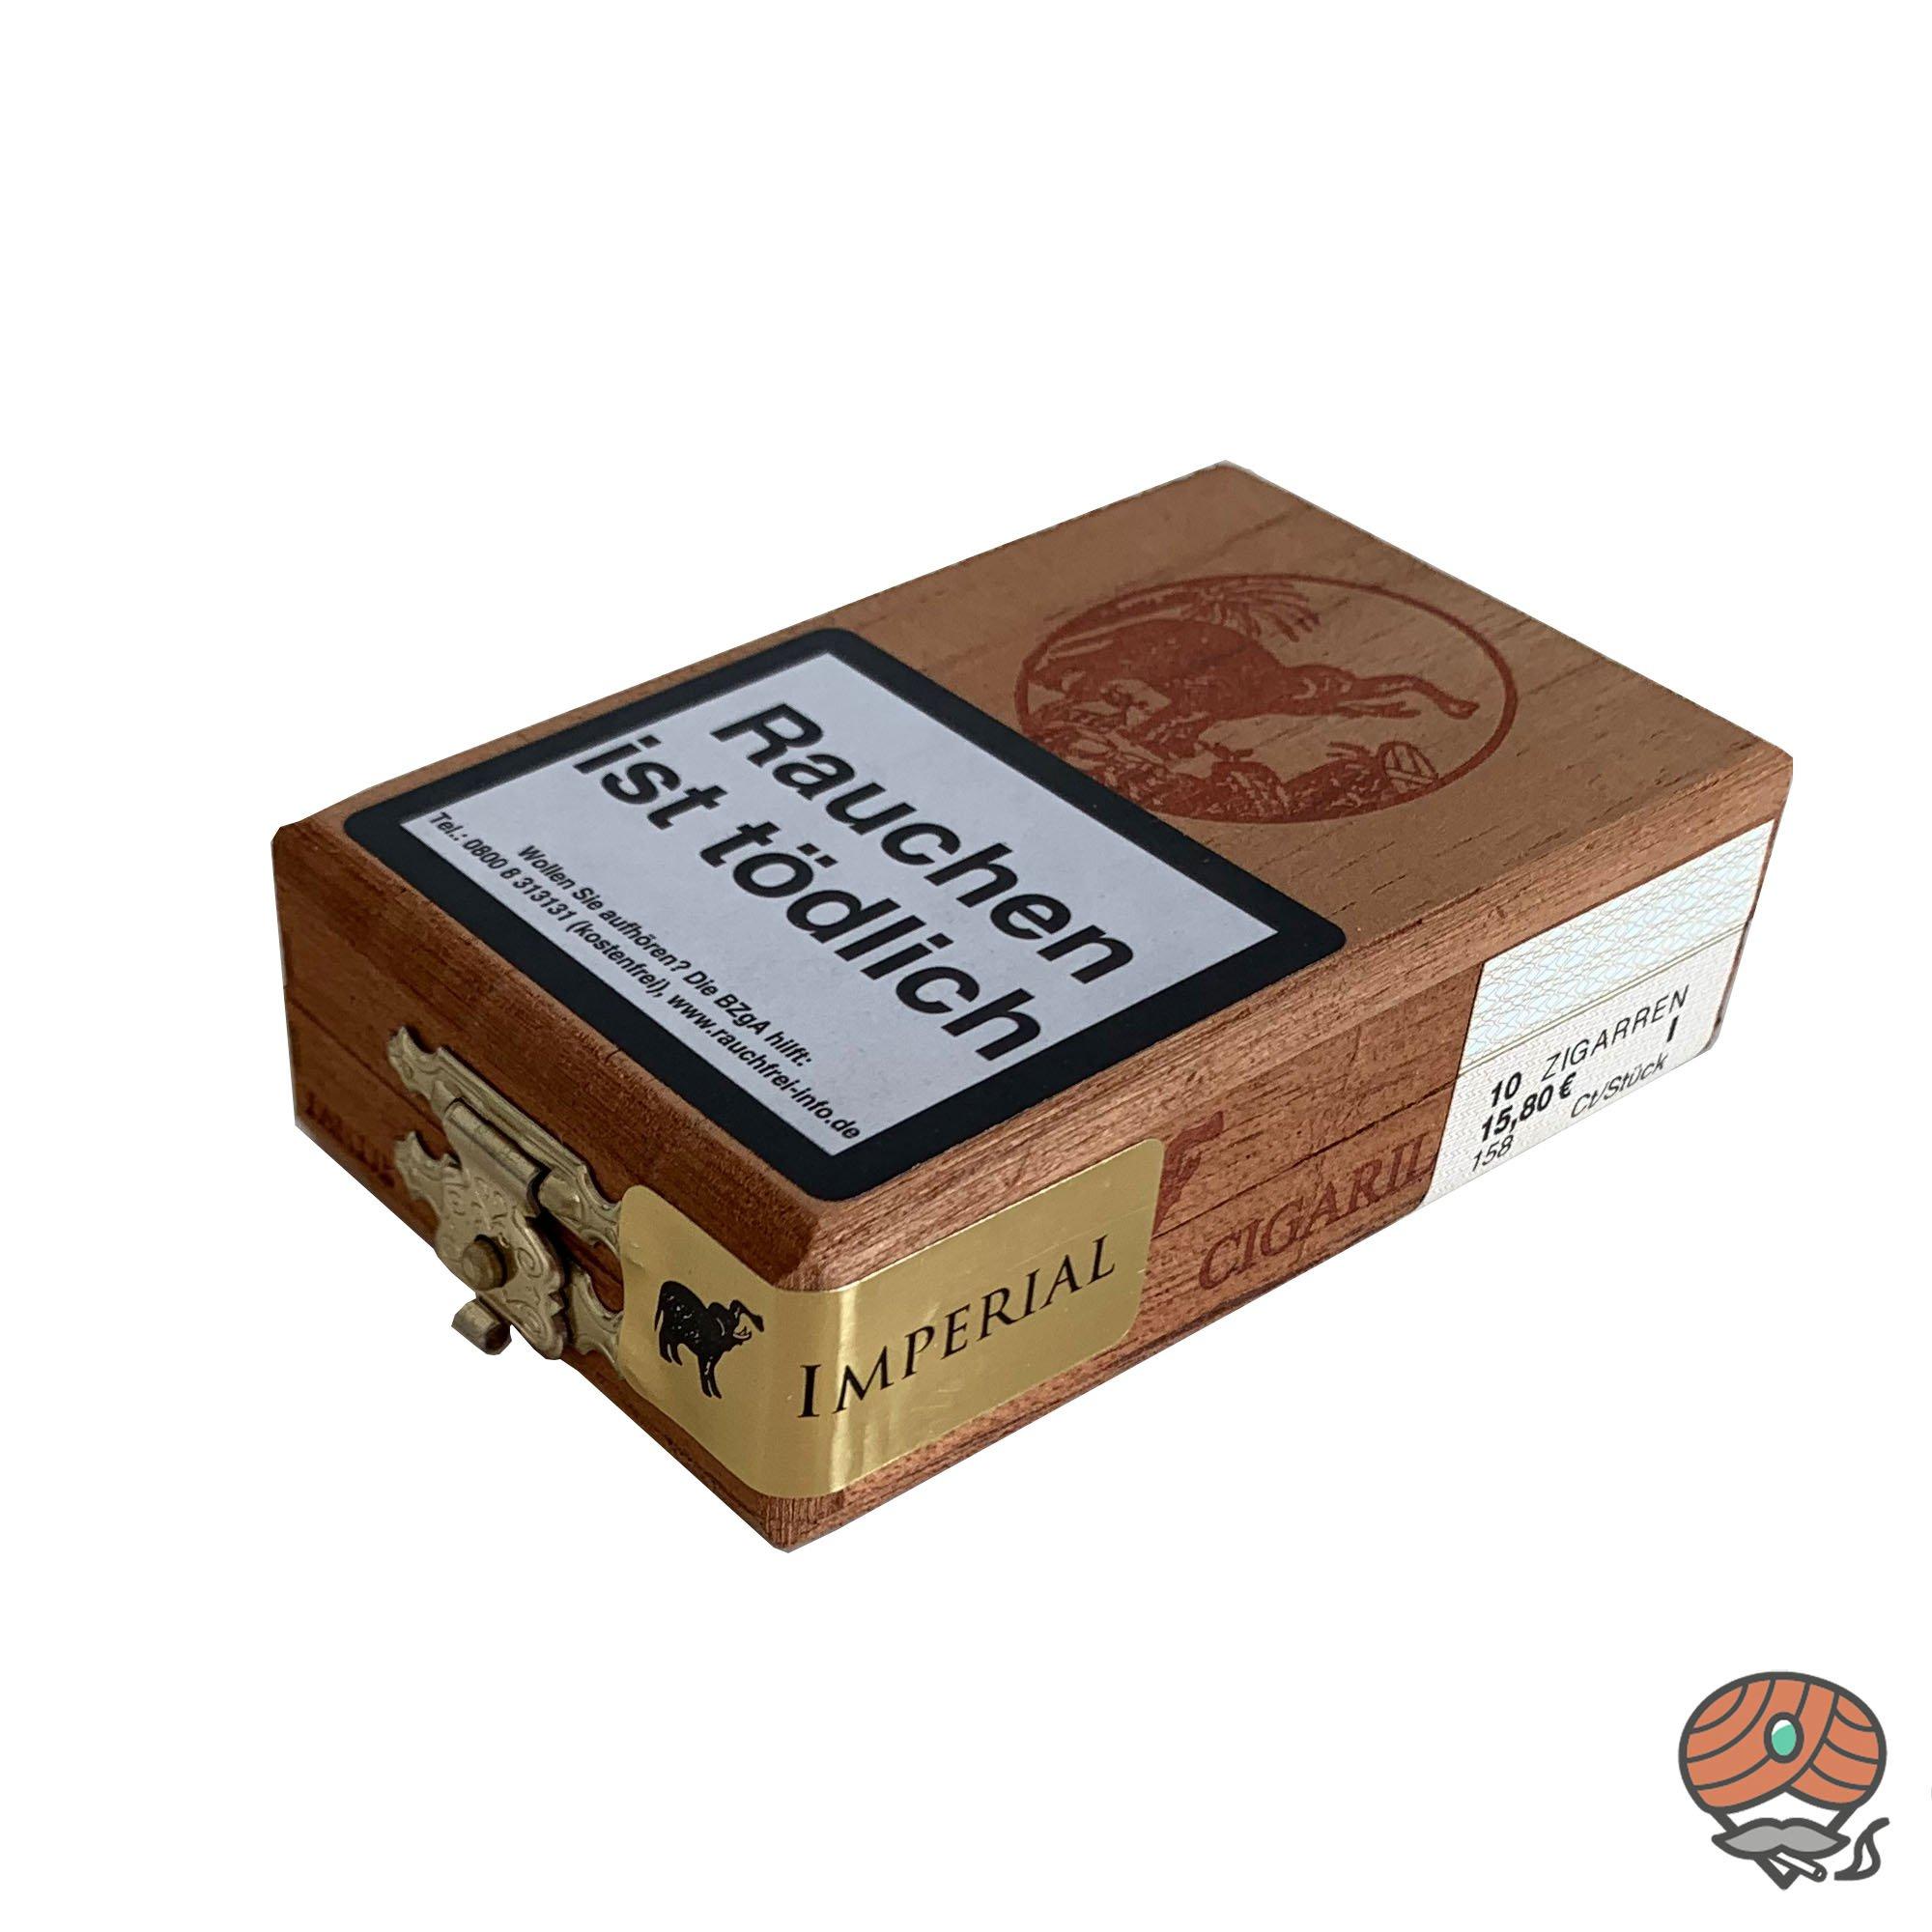 De Olifant Classic Fantje Zigarren 10 Stück